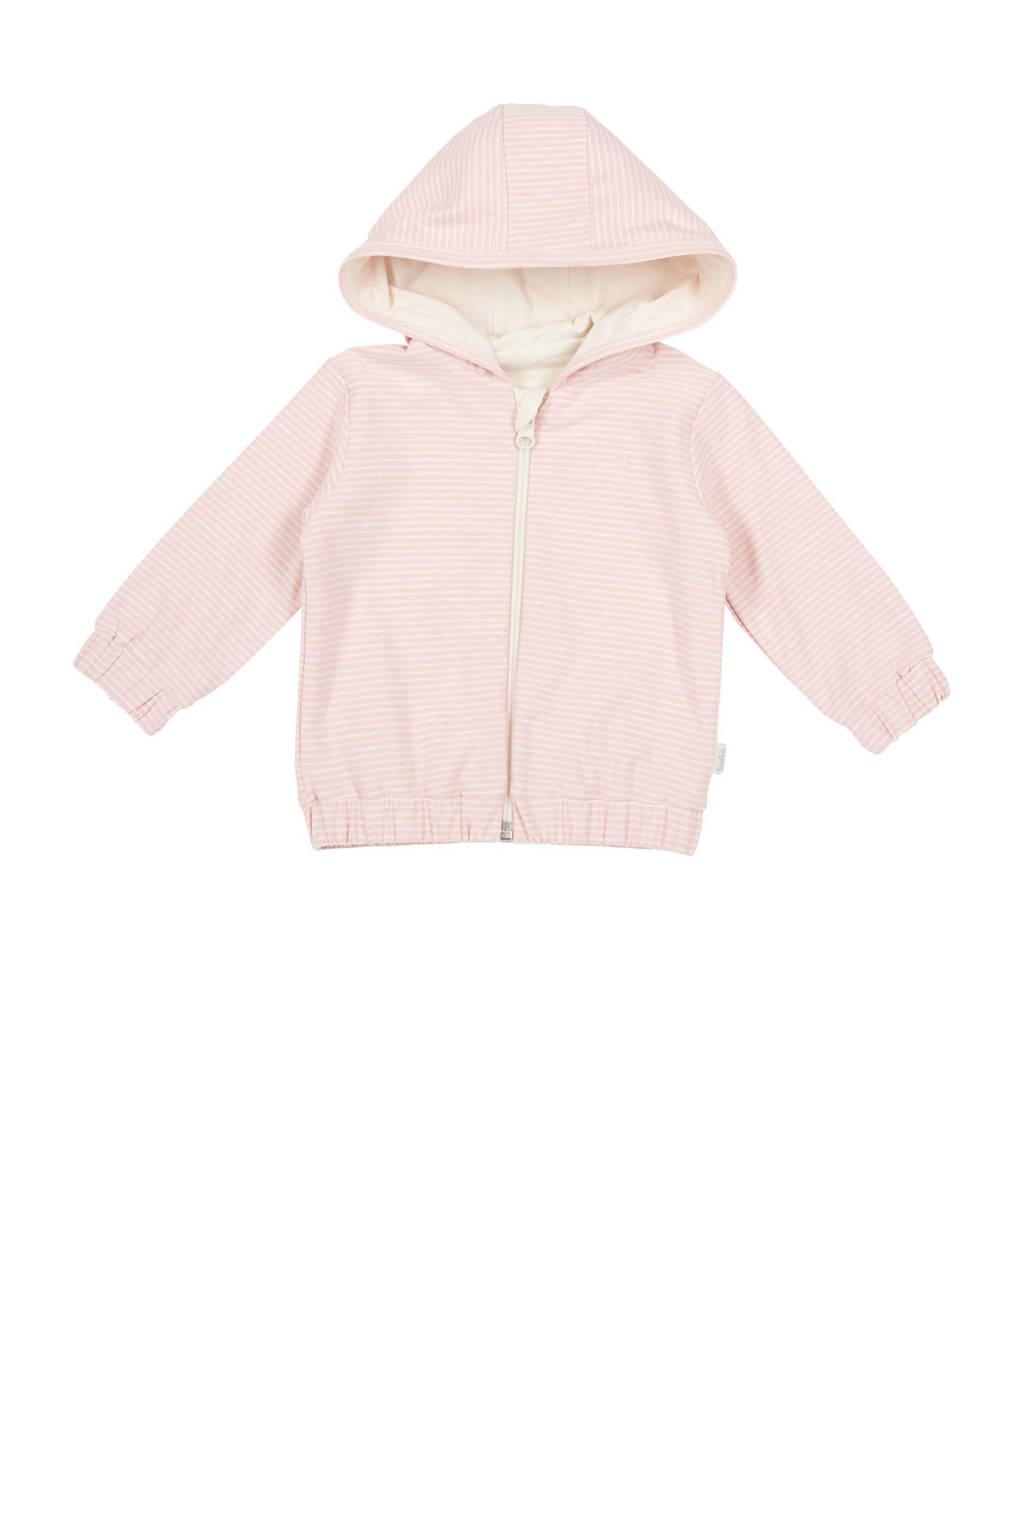 Koeka newborn baby gestreept vest Linescape roze, Roze/wit